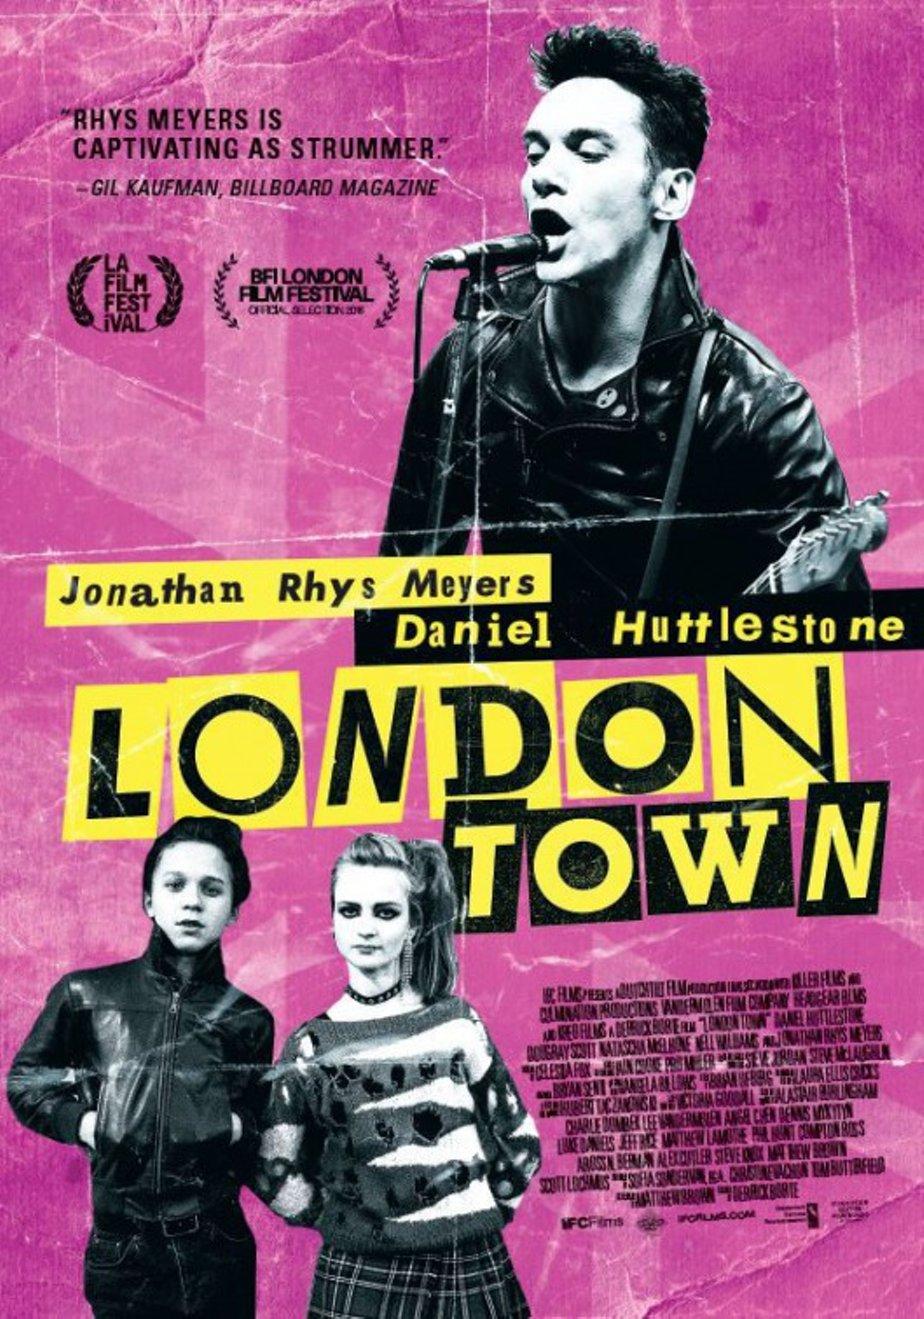 Лондон-Таун (London Town, 2016) рекомендации